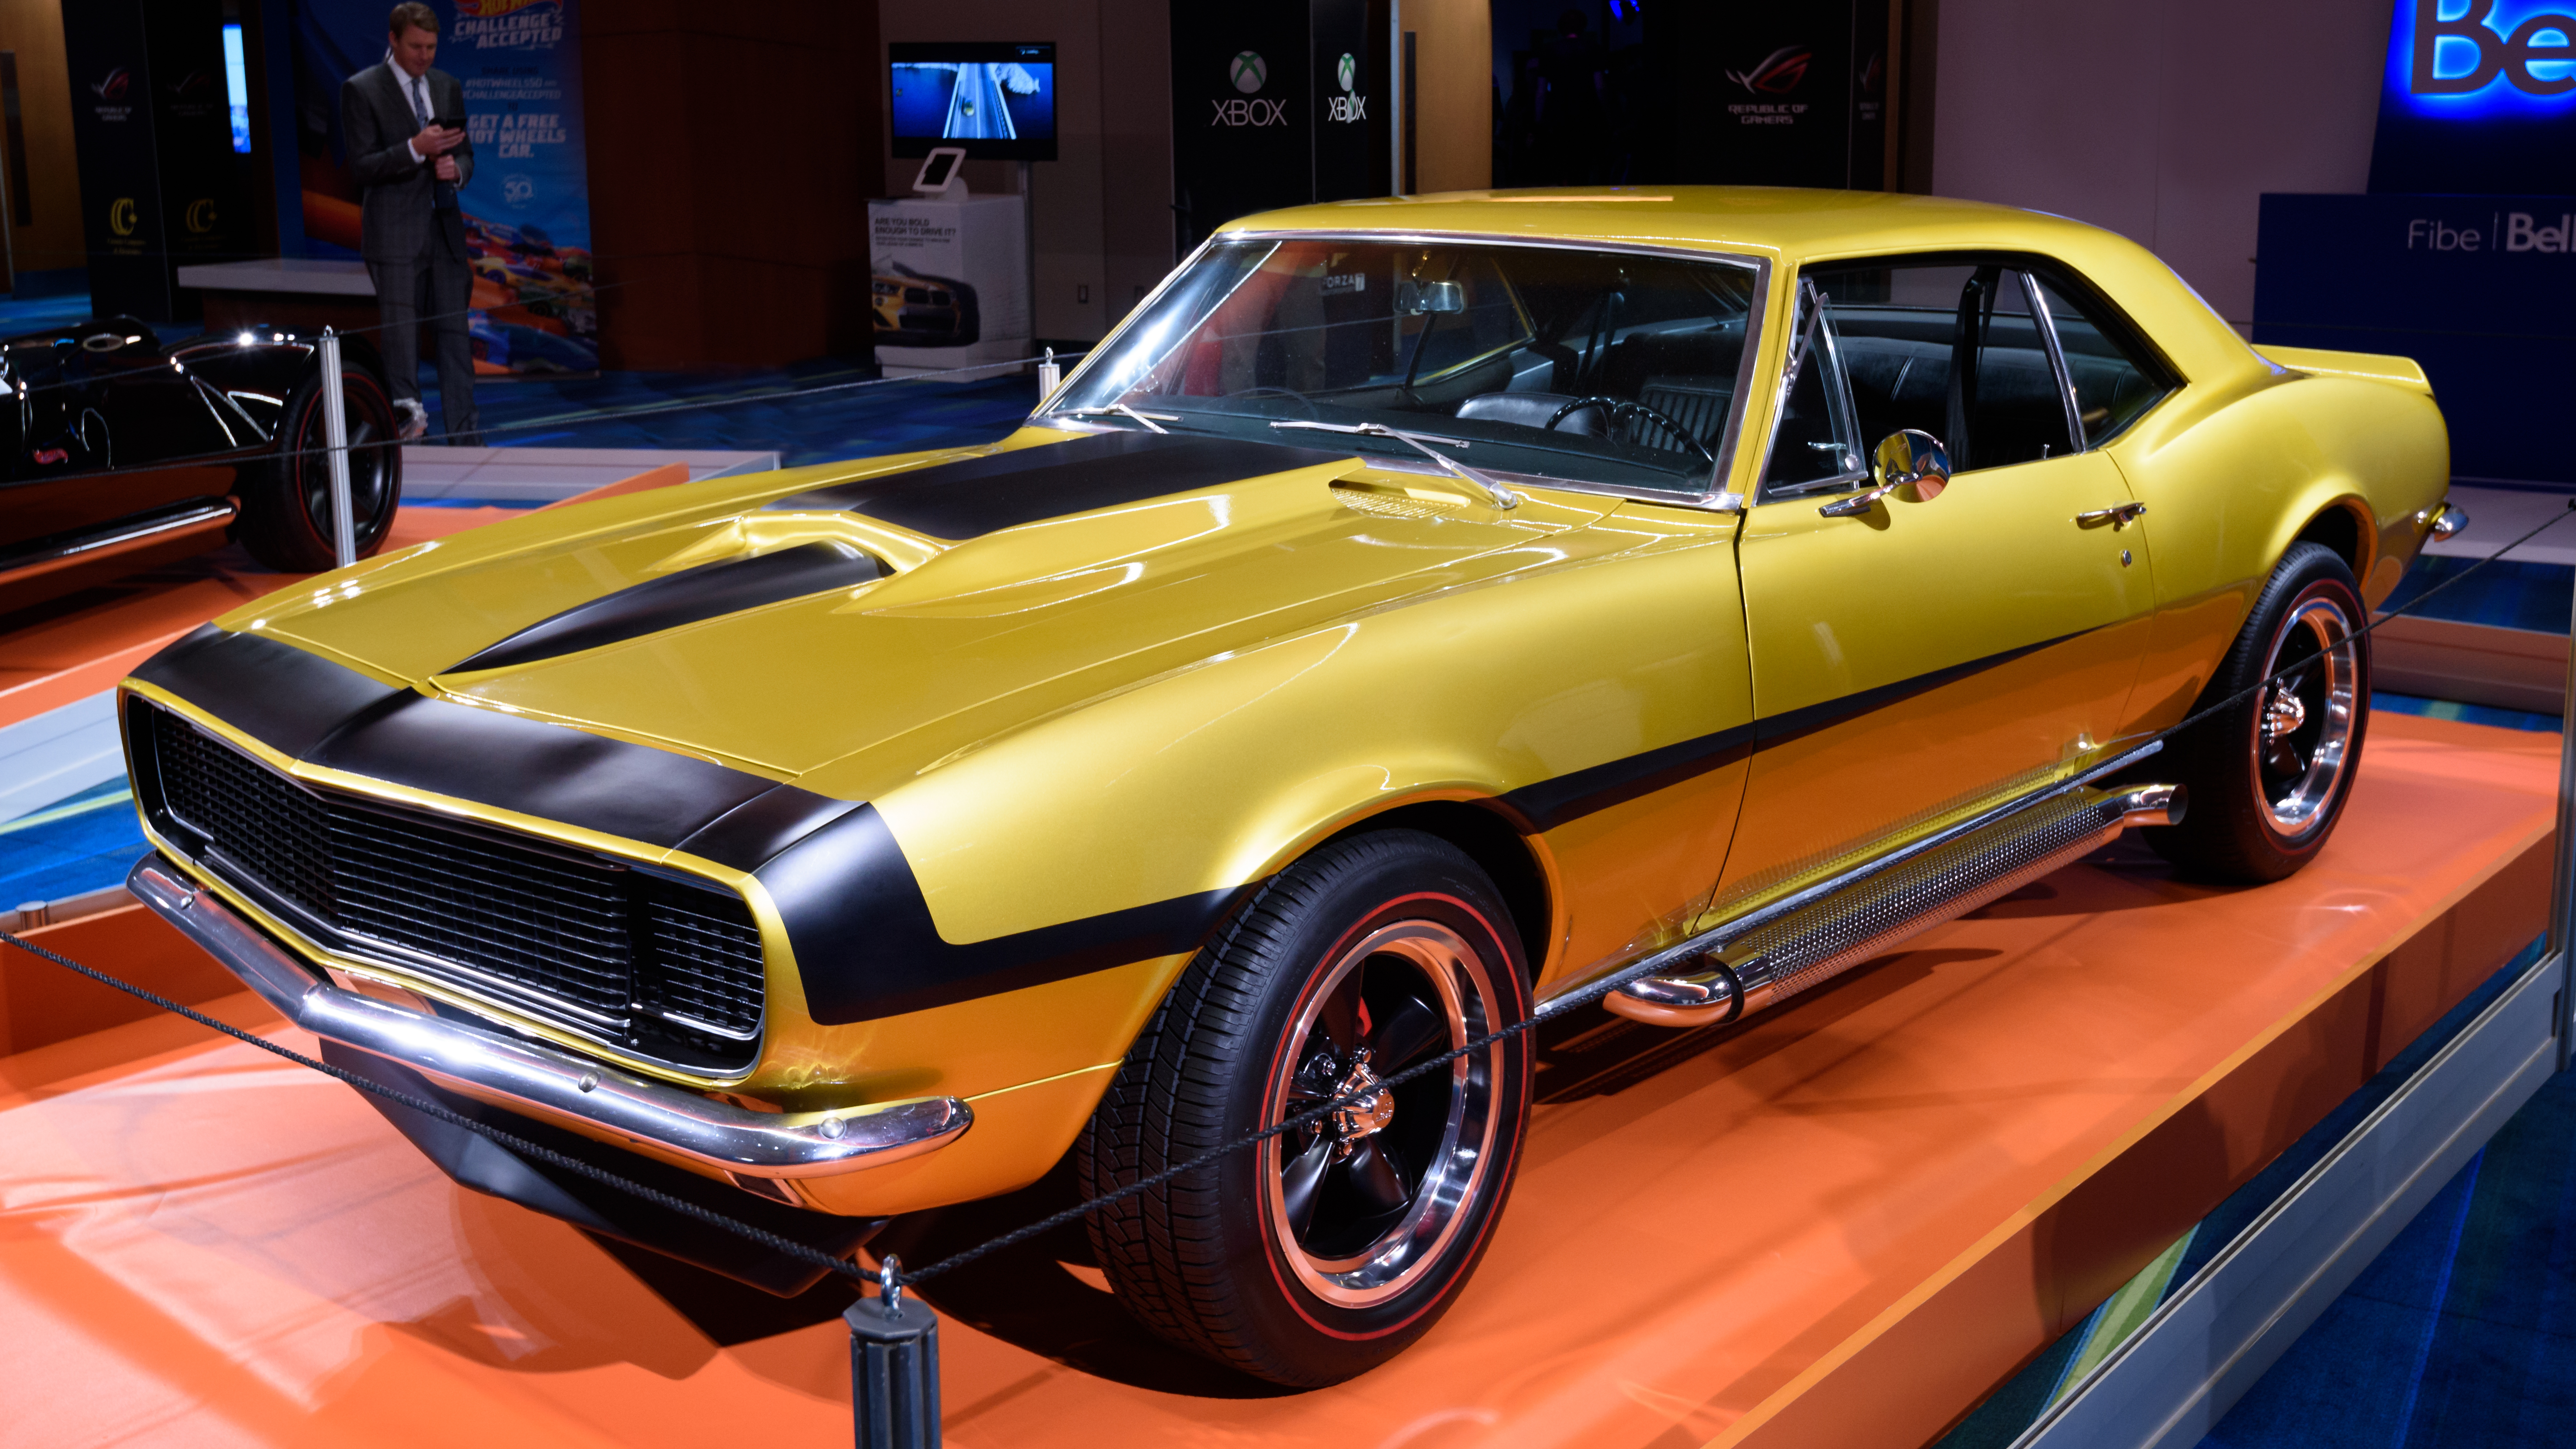 1967 Chevrolet Camaro - Hot Wheels Replica, 2018, International, Toronto, Show, HQ Photo